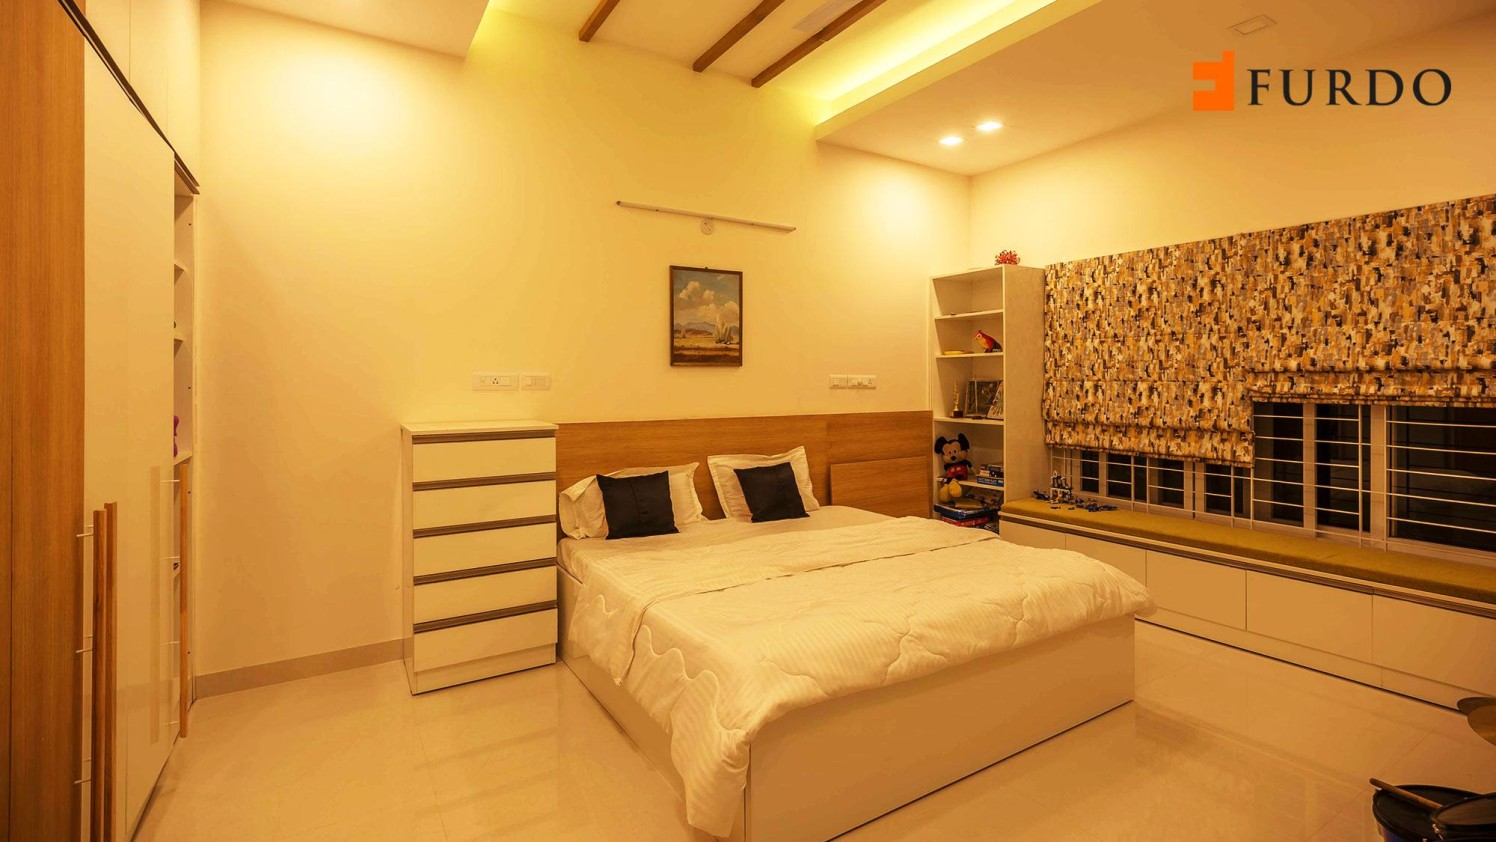 Bedroom With Pale Shade Interiors by Furdo.com Bedroom Modern | Interior Design Photos & Ideas